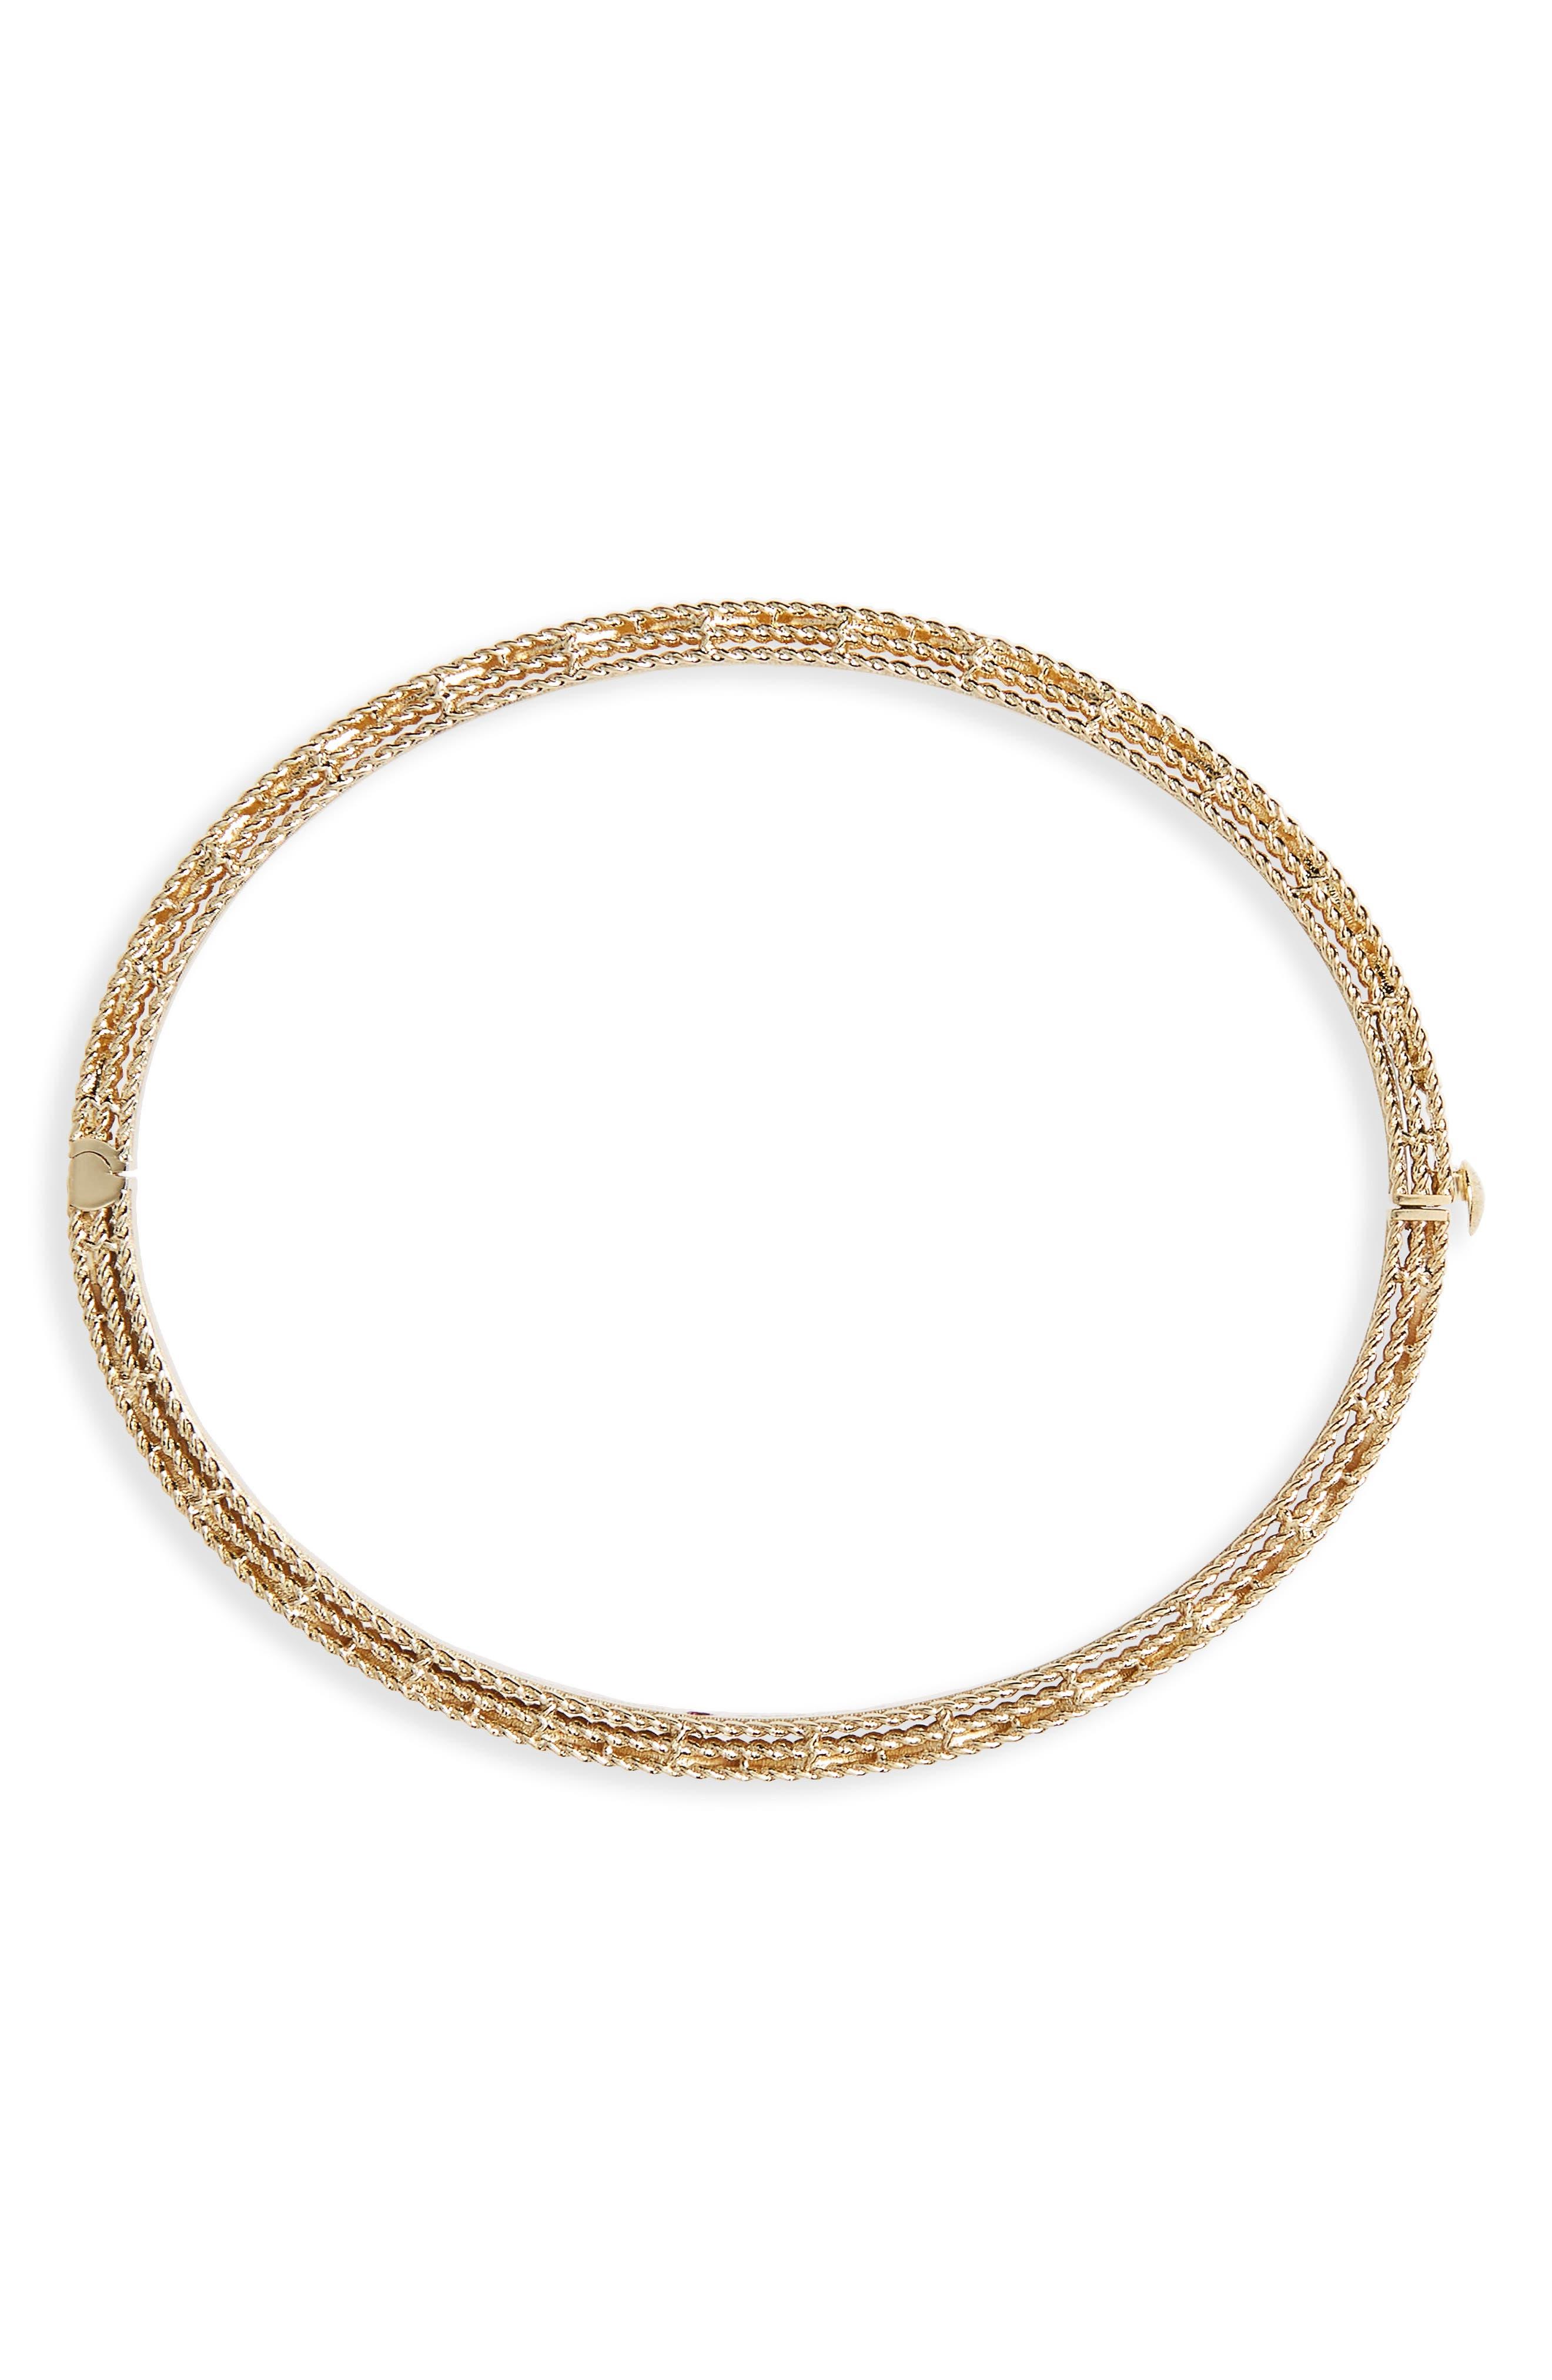 ROBERTO COIN,                             Princess Diamond Bracelet,                             Alternate thumbnail 3, color,                             YELLOW GOLD